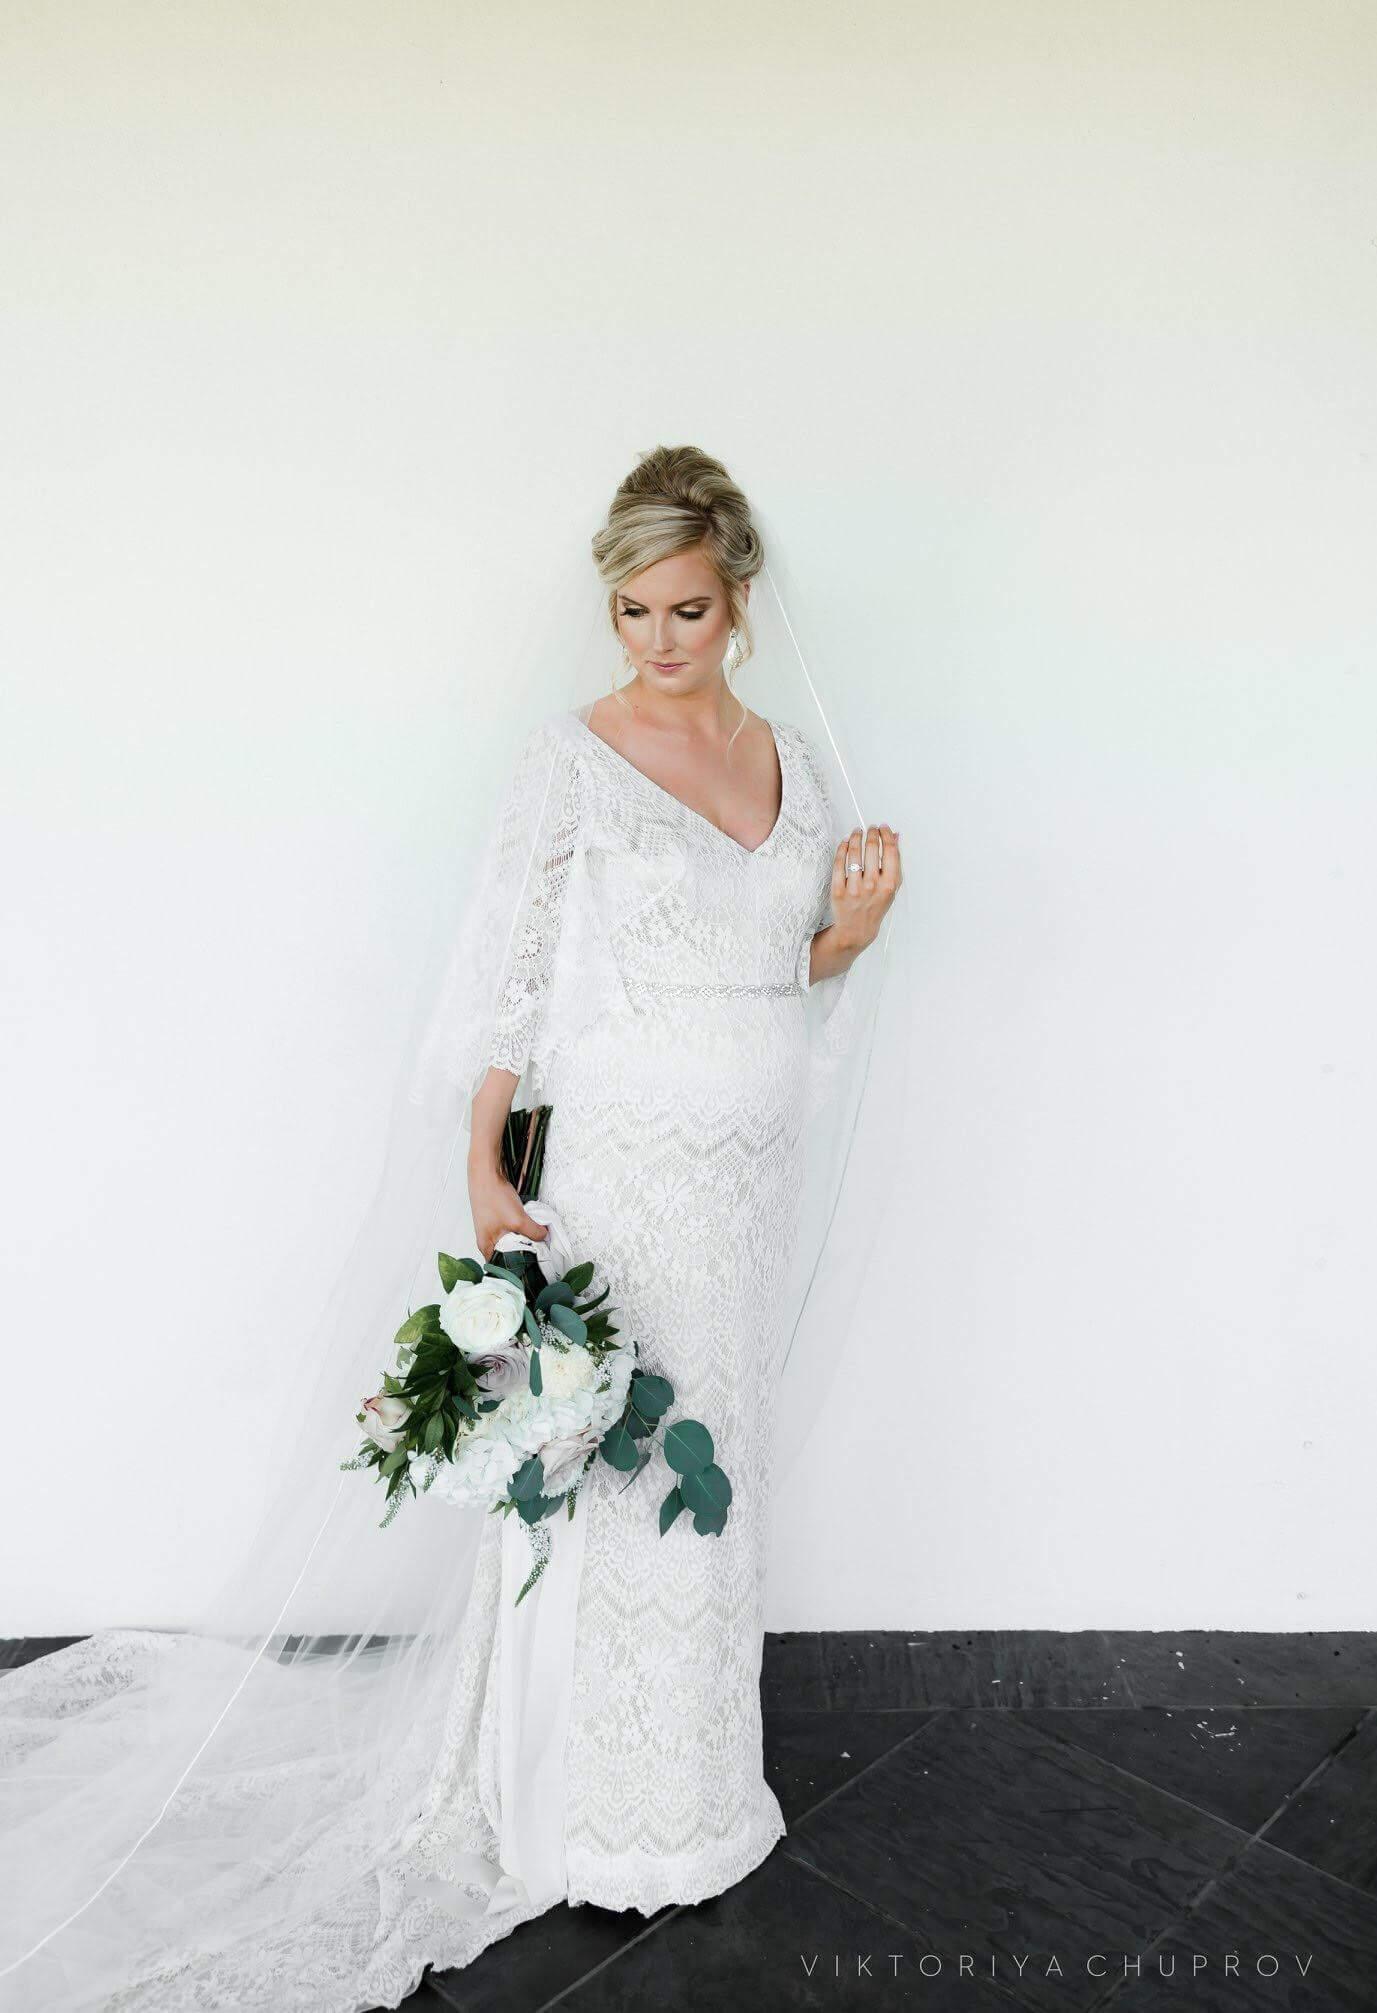 jacksonville florida bride wedding dress beach wedding